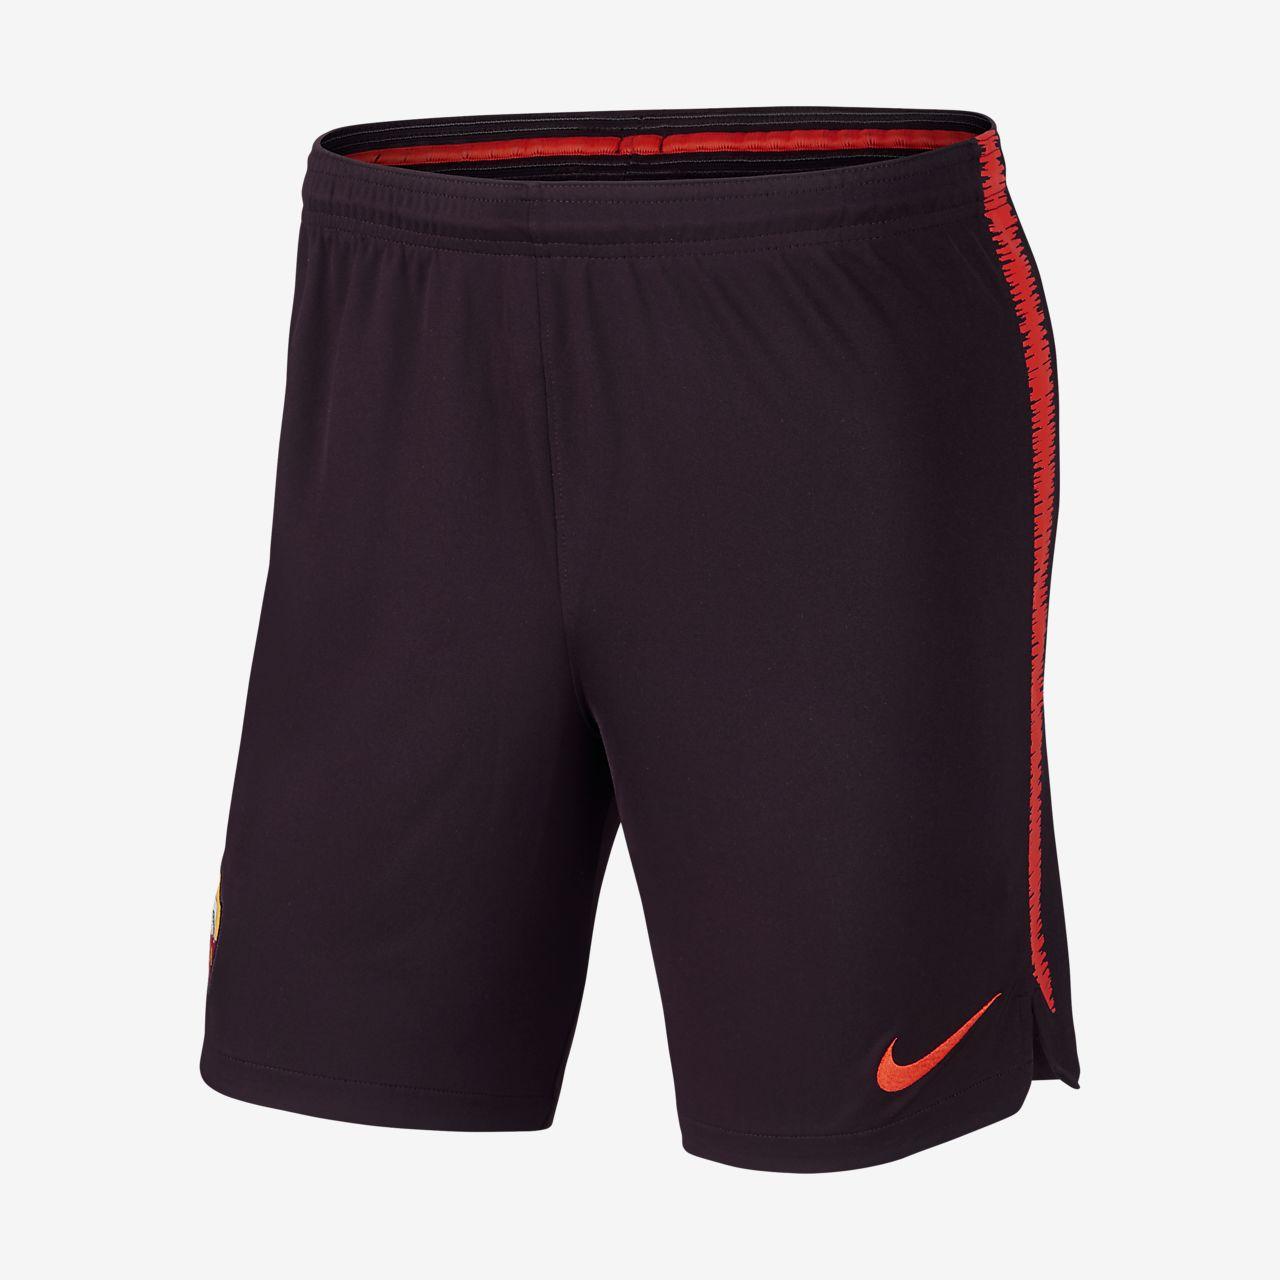 A.S. Roma Dri-FIT Squad Men's Football Shorts